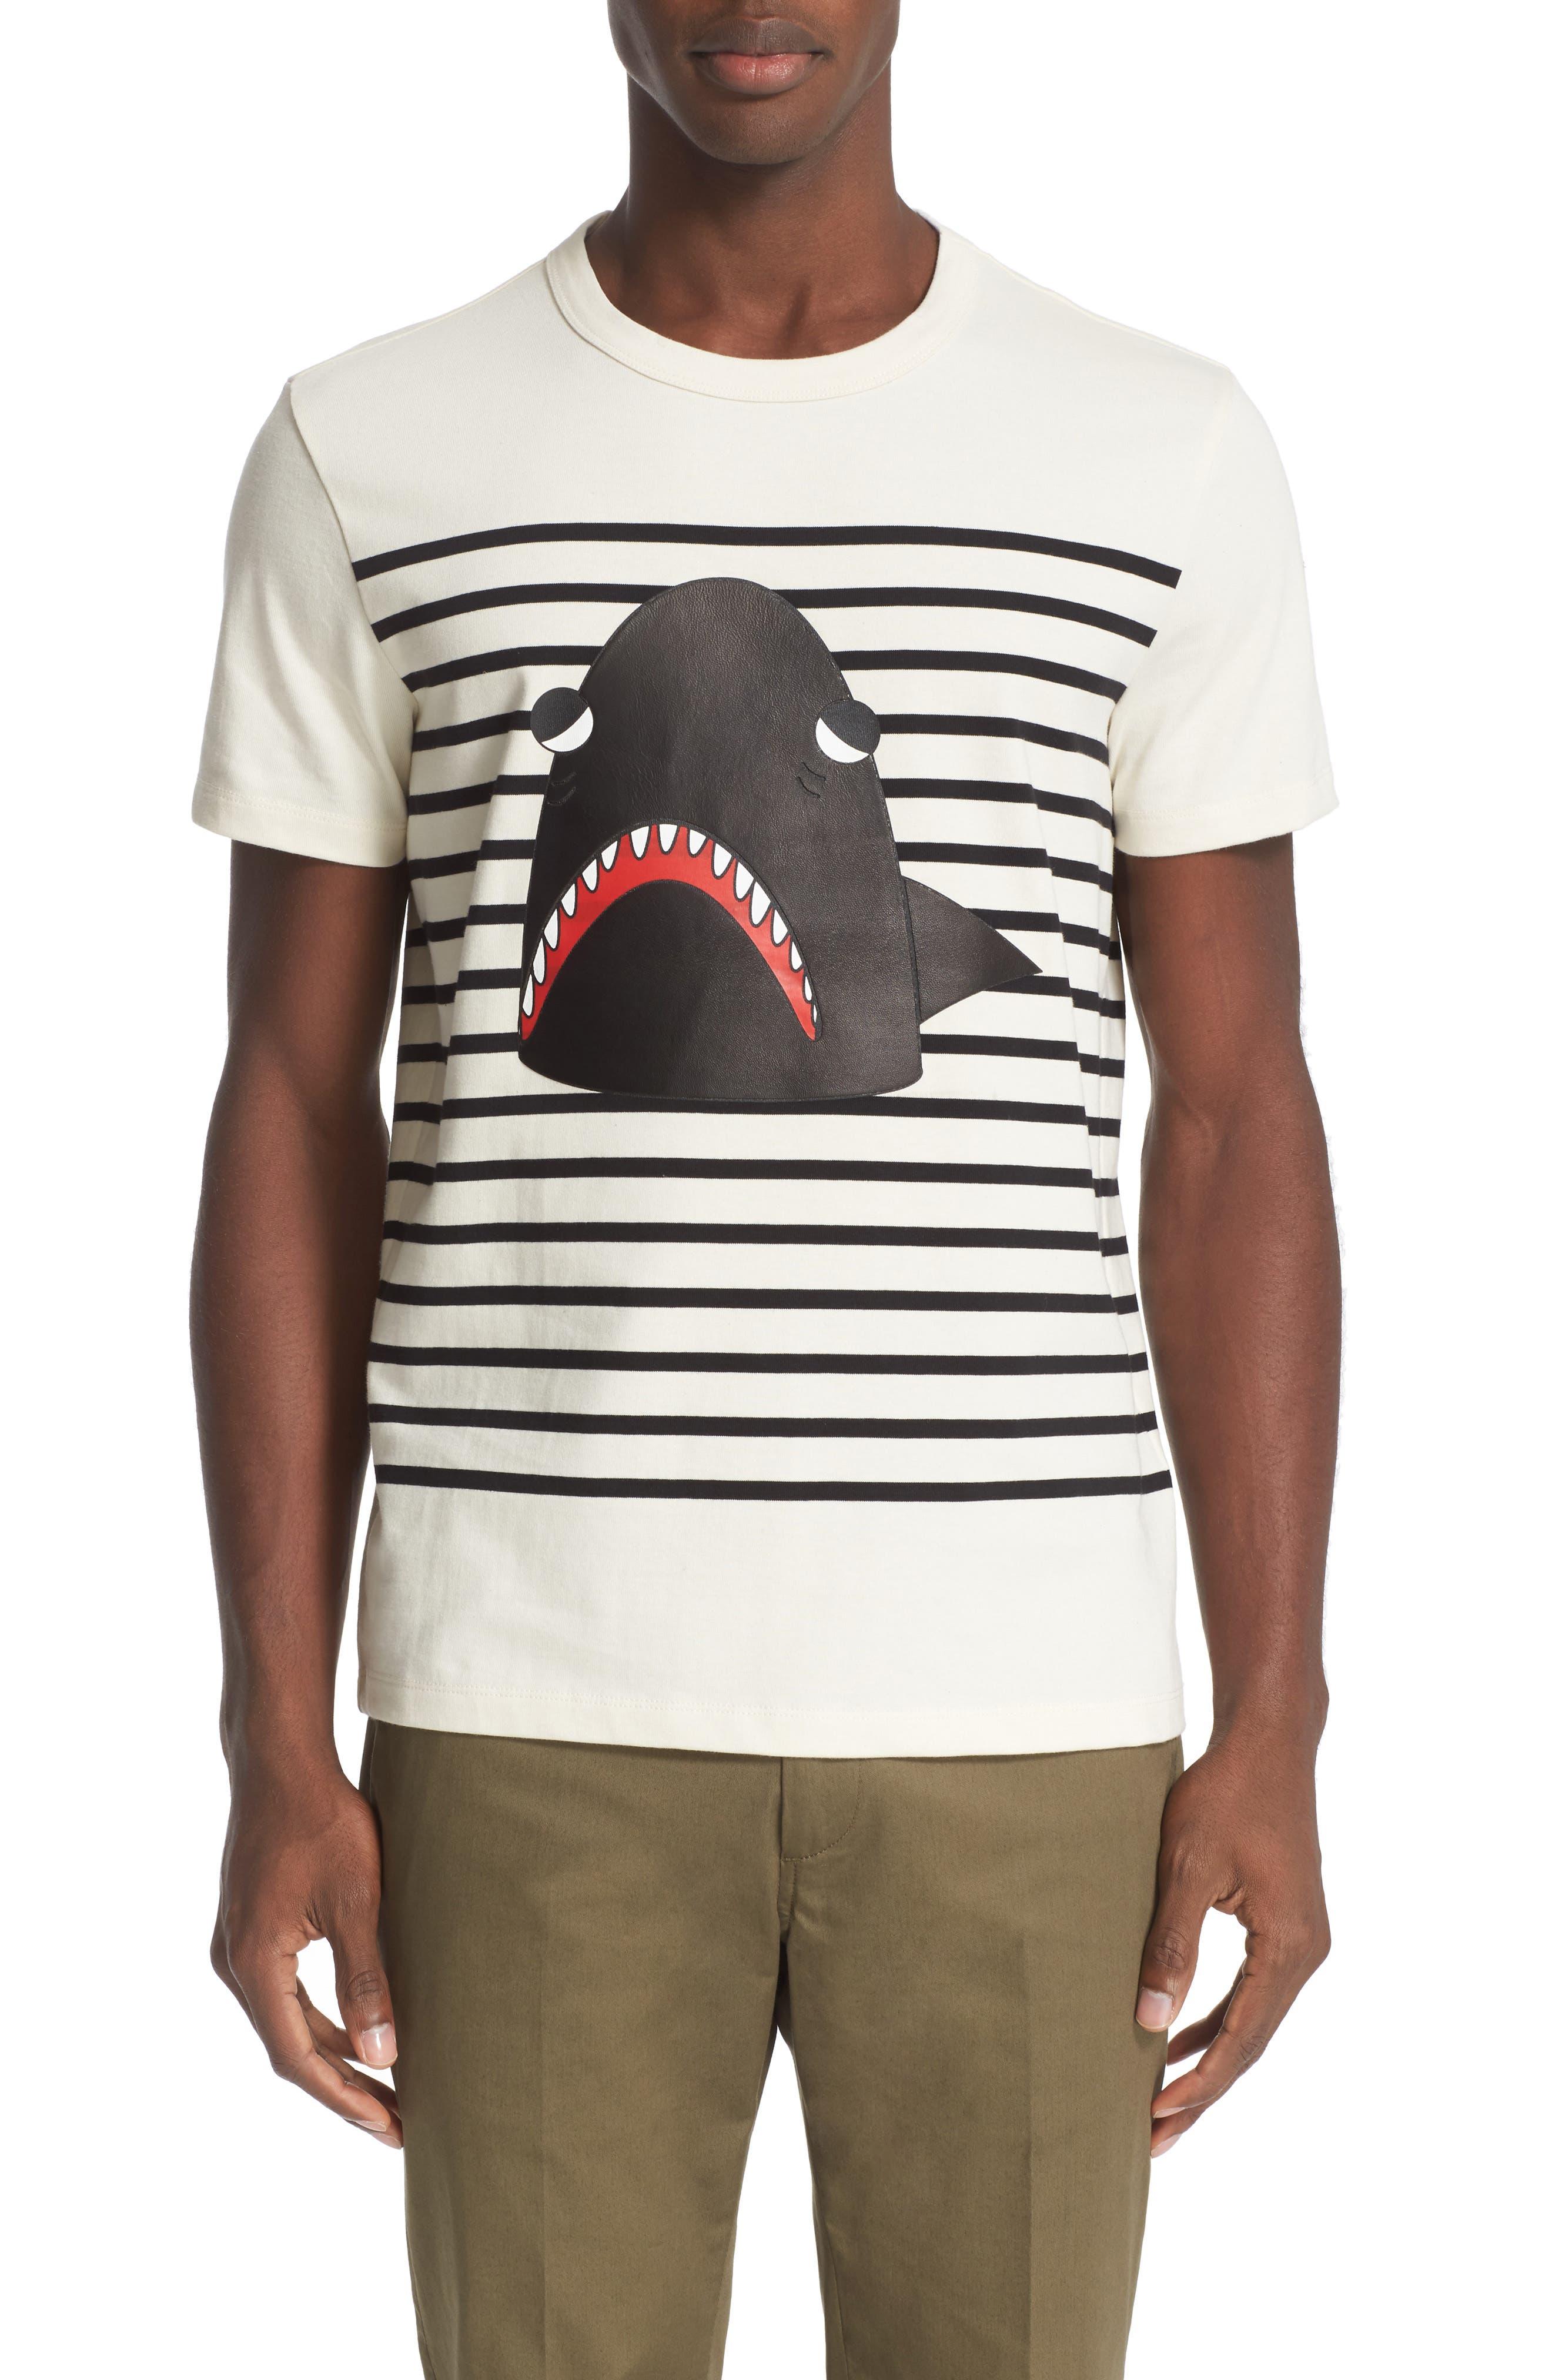 Alternate Image 1 Selected - Moncler Stripe Graphic T-Shirt